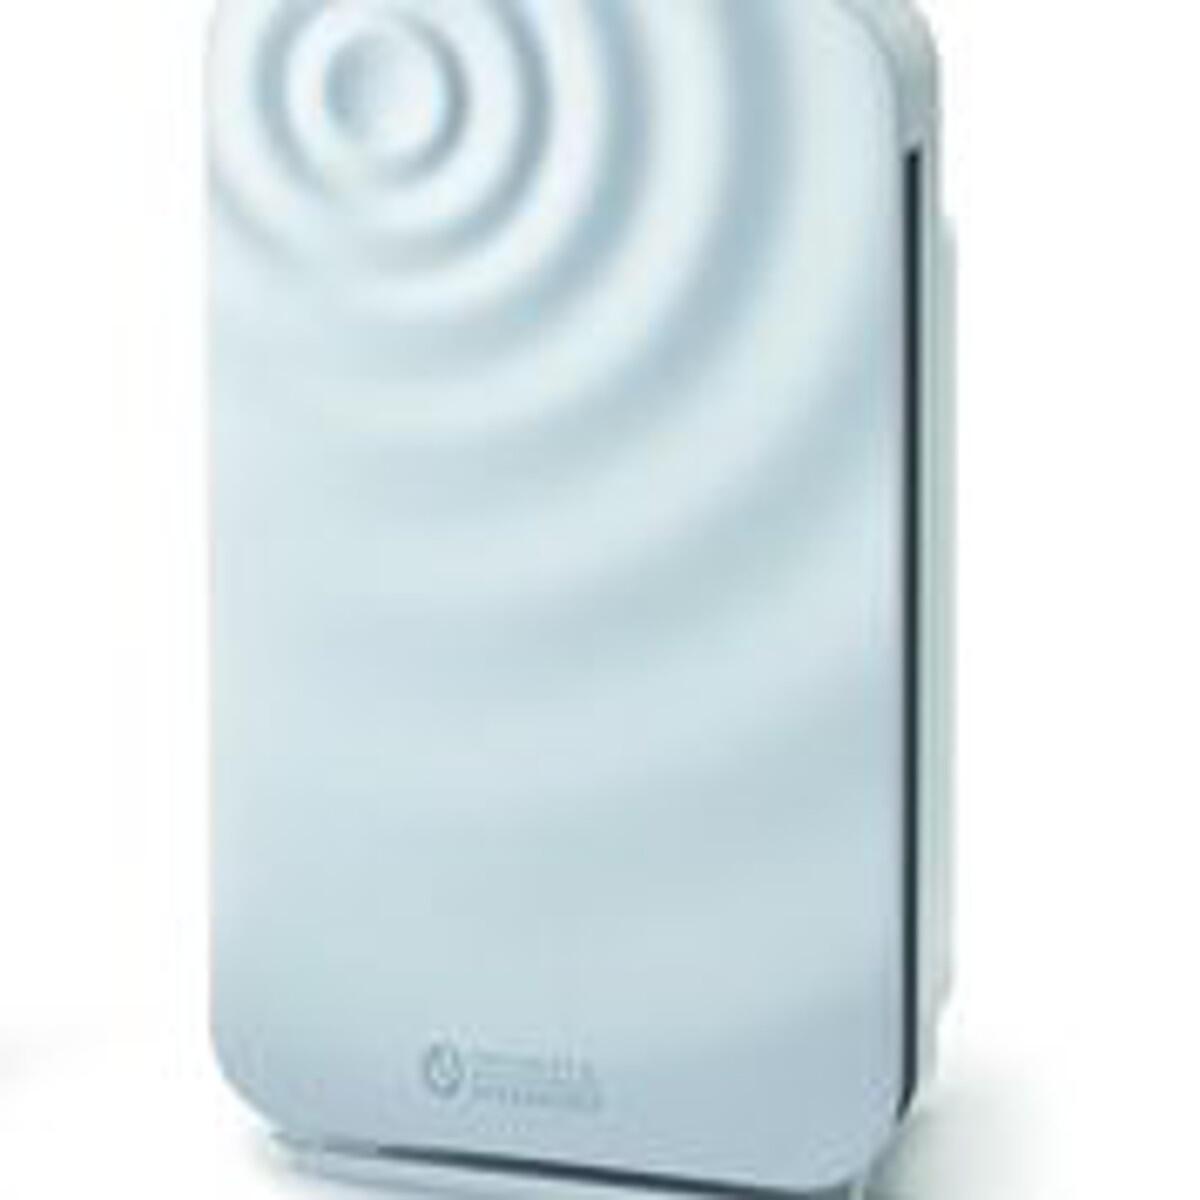 Purificatore di aria OLIMPIA SPLENDID Aura Li bianco - 5